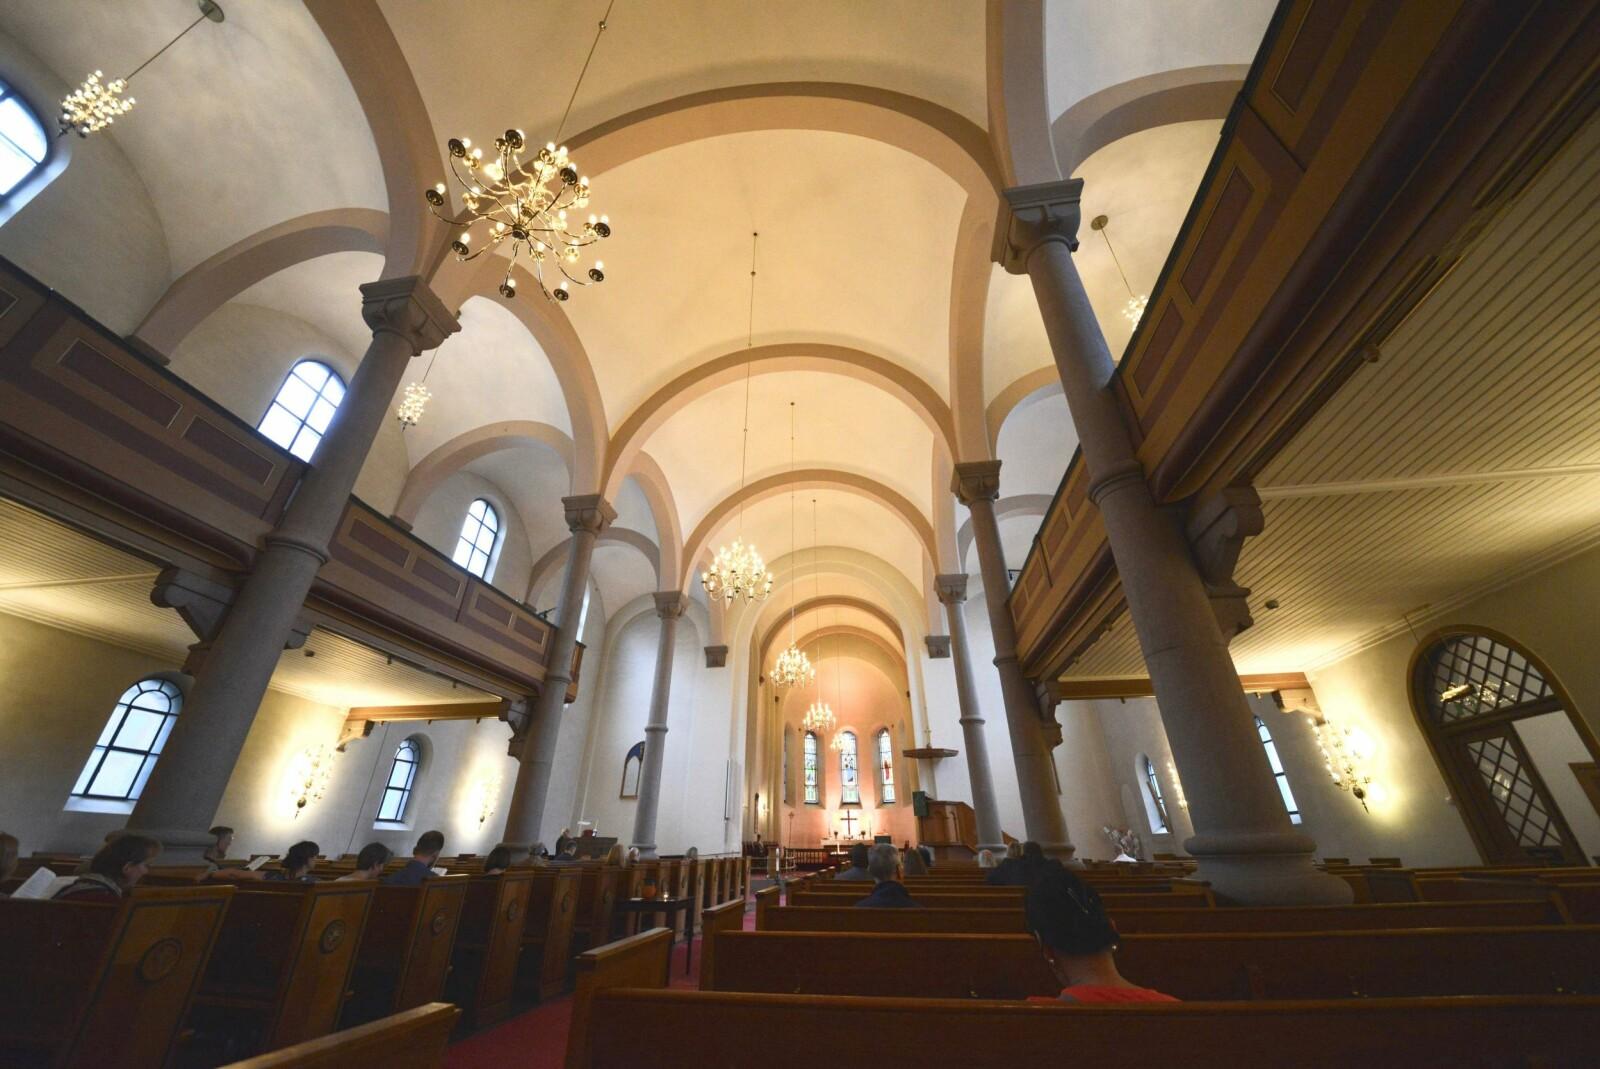 <b><SPAN CLASS=BOLD>GLISSENT:</b></span> Grønland kirke har 880 sitteplasser. 35 personer var til stede under gudstjeneste med nattverd 11. august 2019.